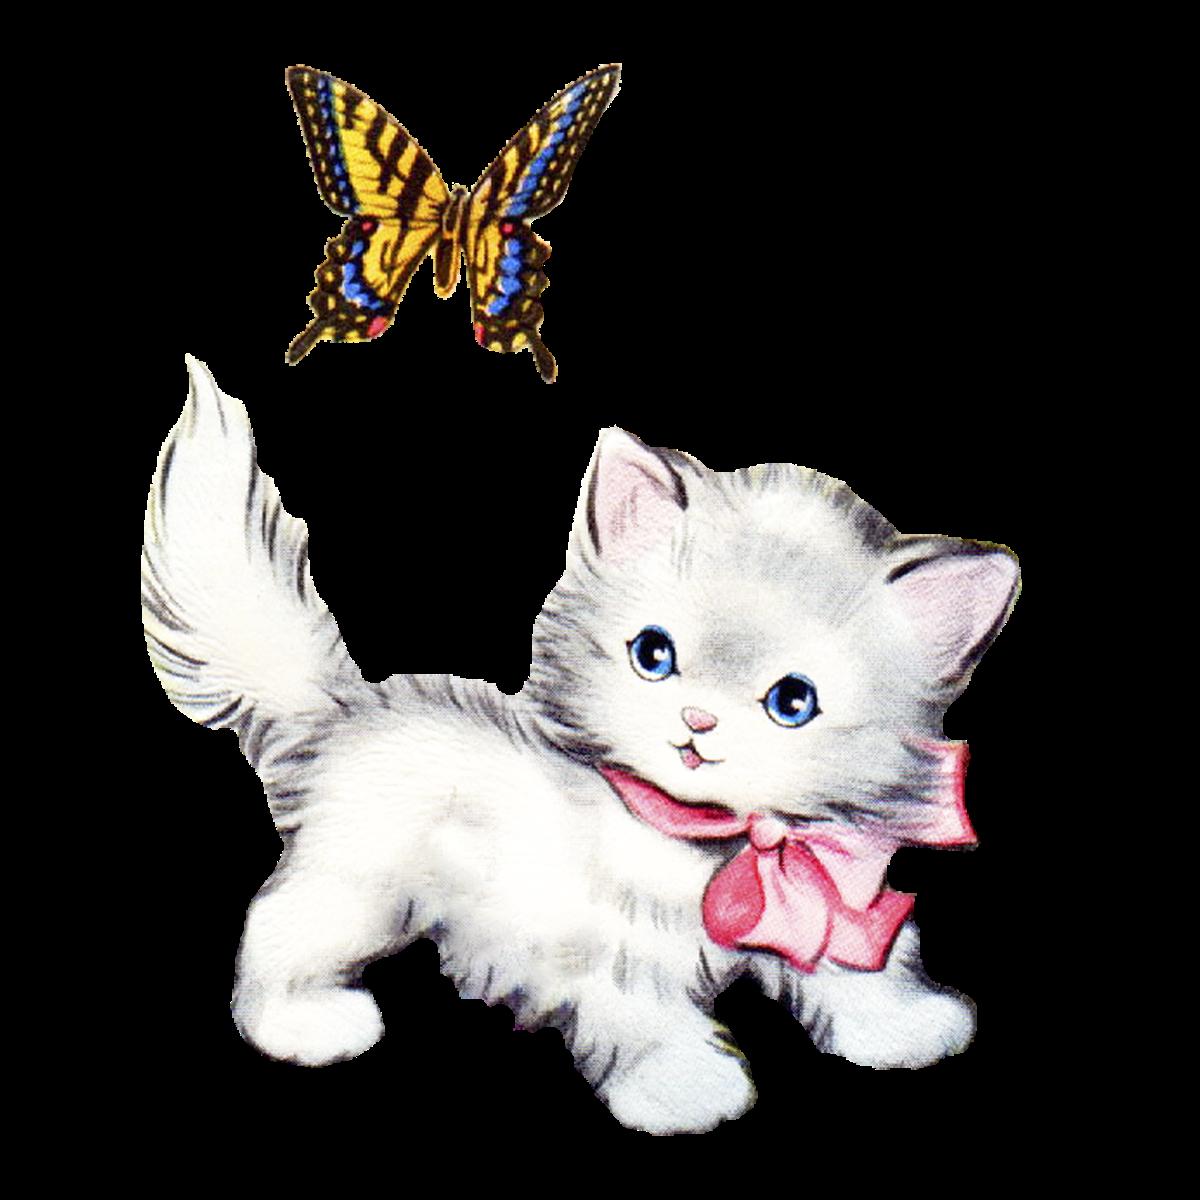 Free clipart kitten. Vintage clip art alternative